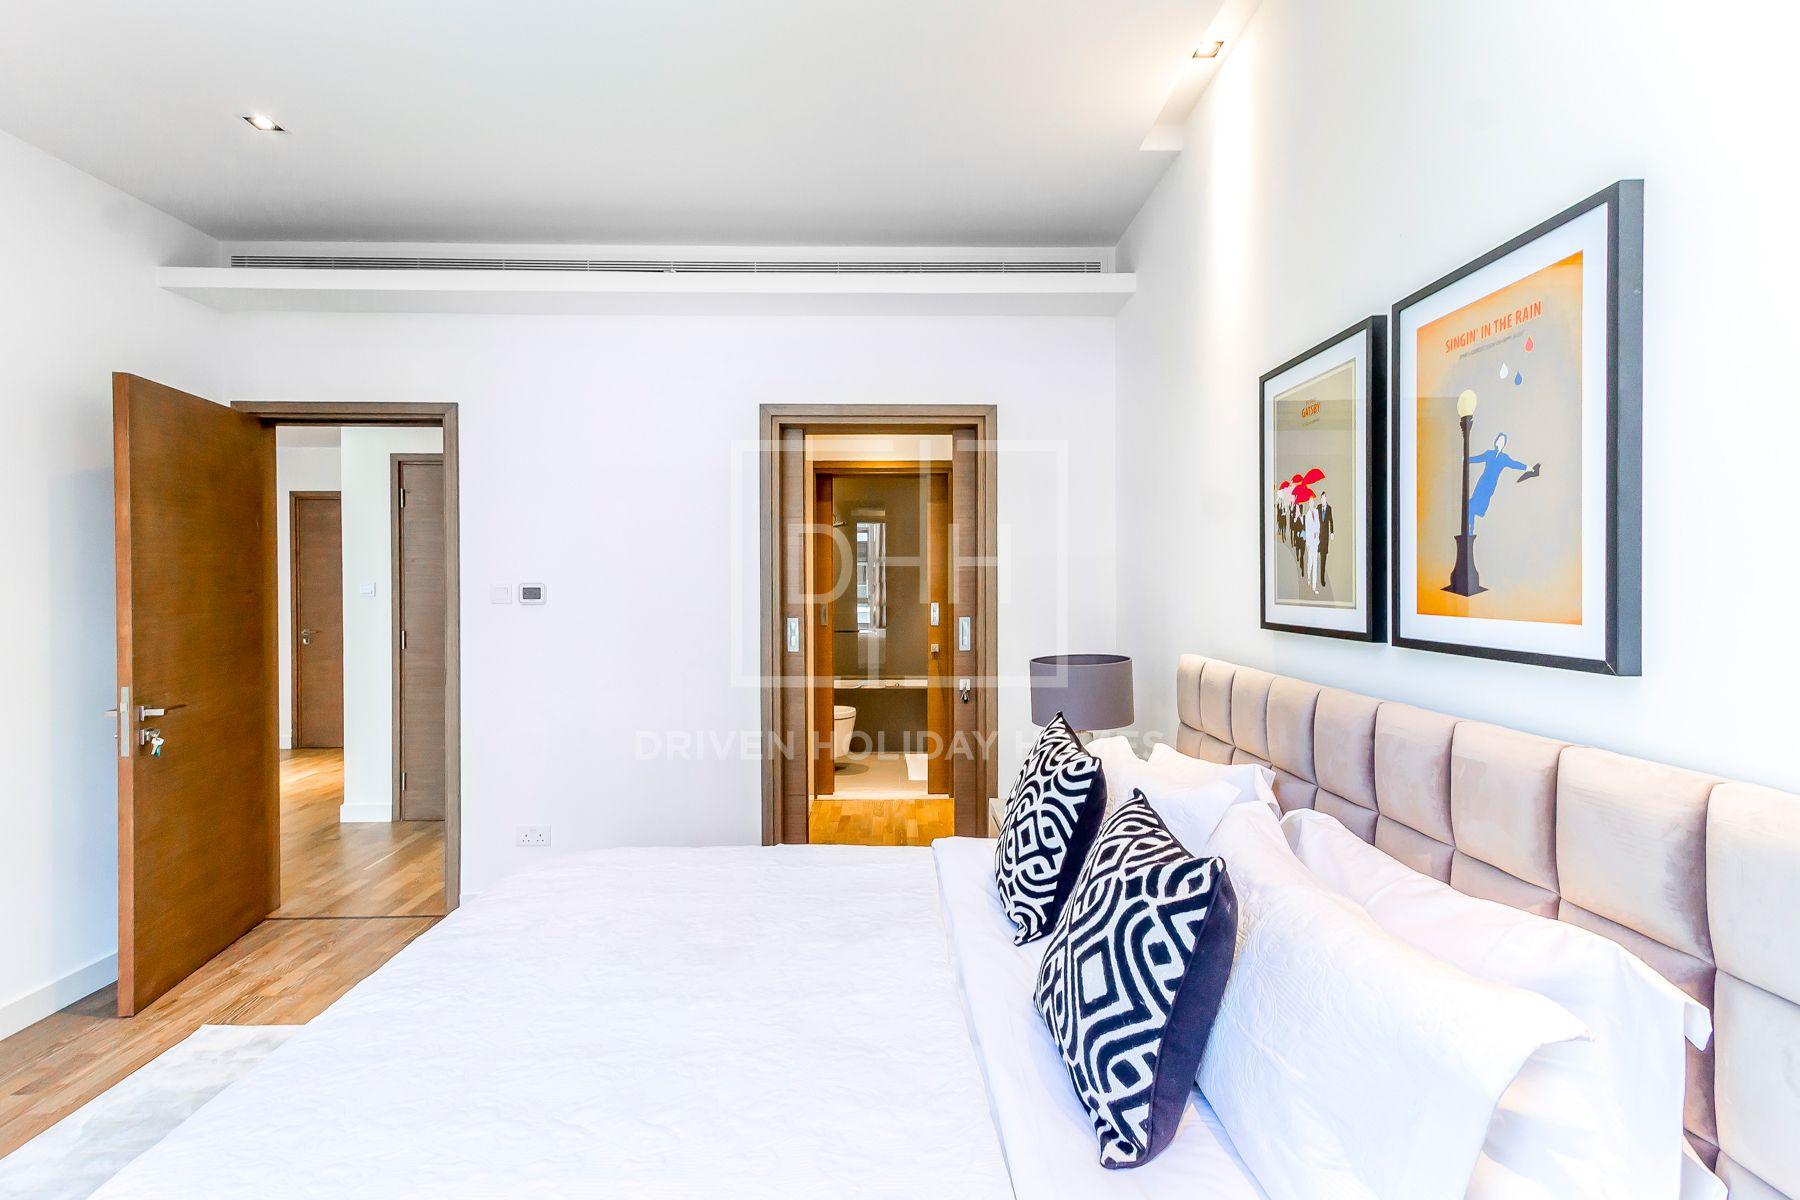 Fabulous Yet Homey | 1 Bed |City Walk Bldg 22